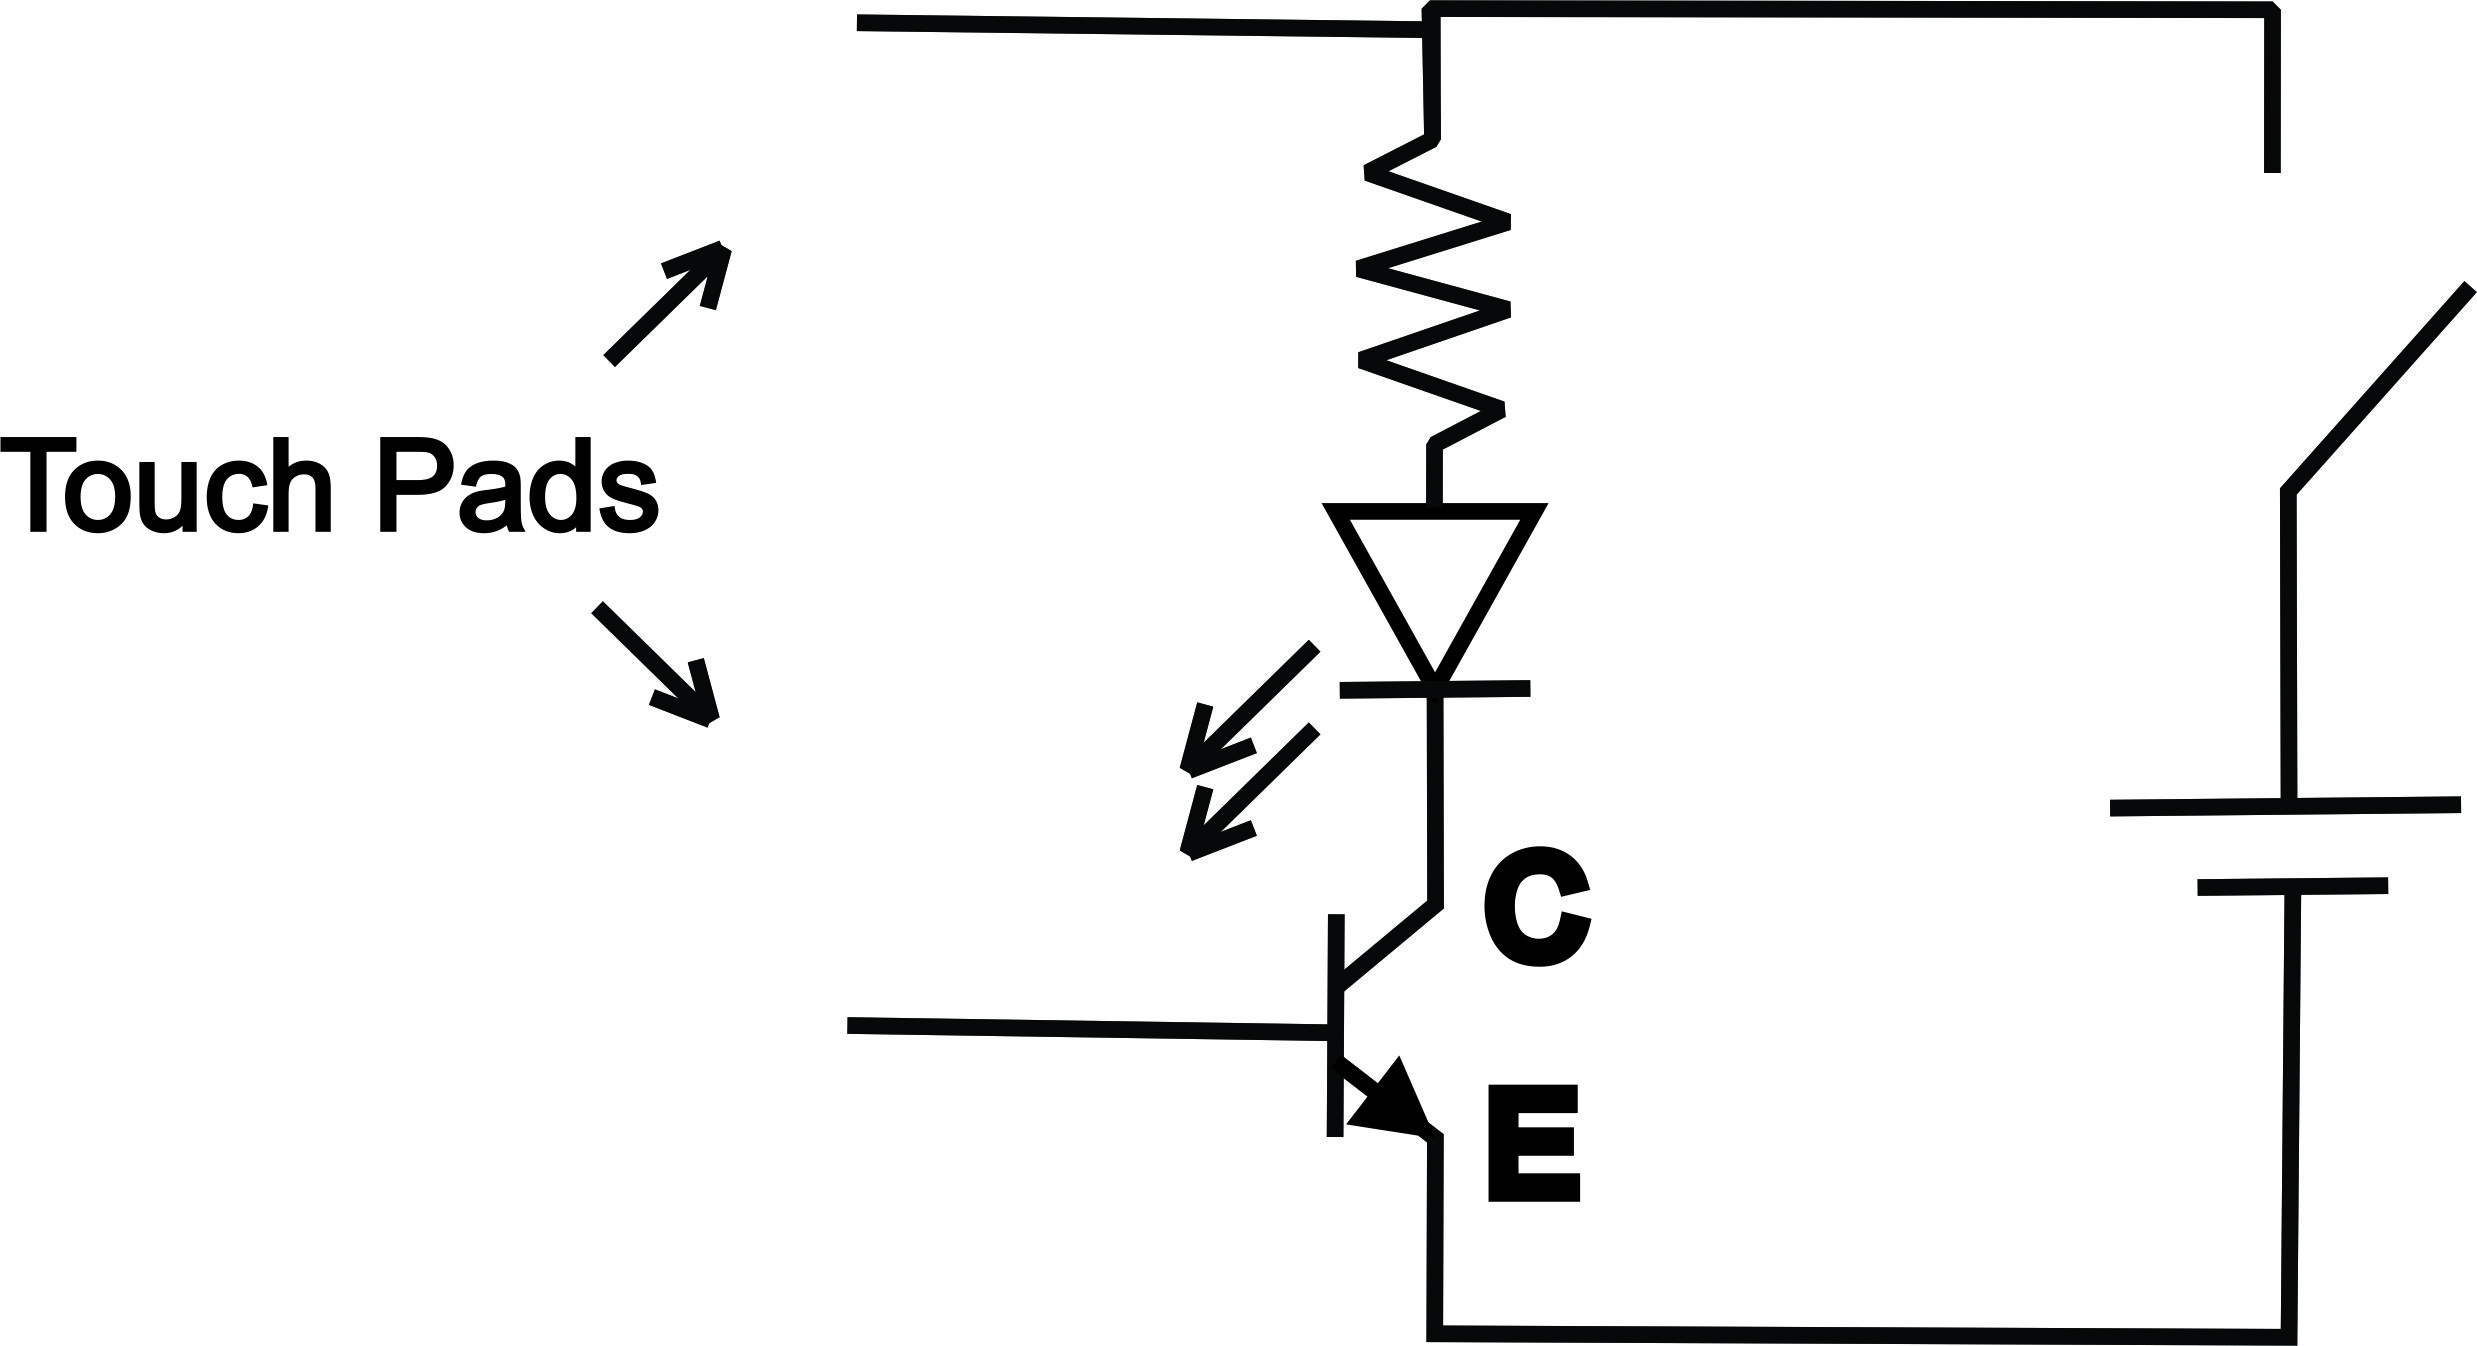 VUC - TouchPad Circuit Diagram.jpg